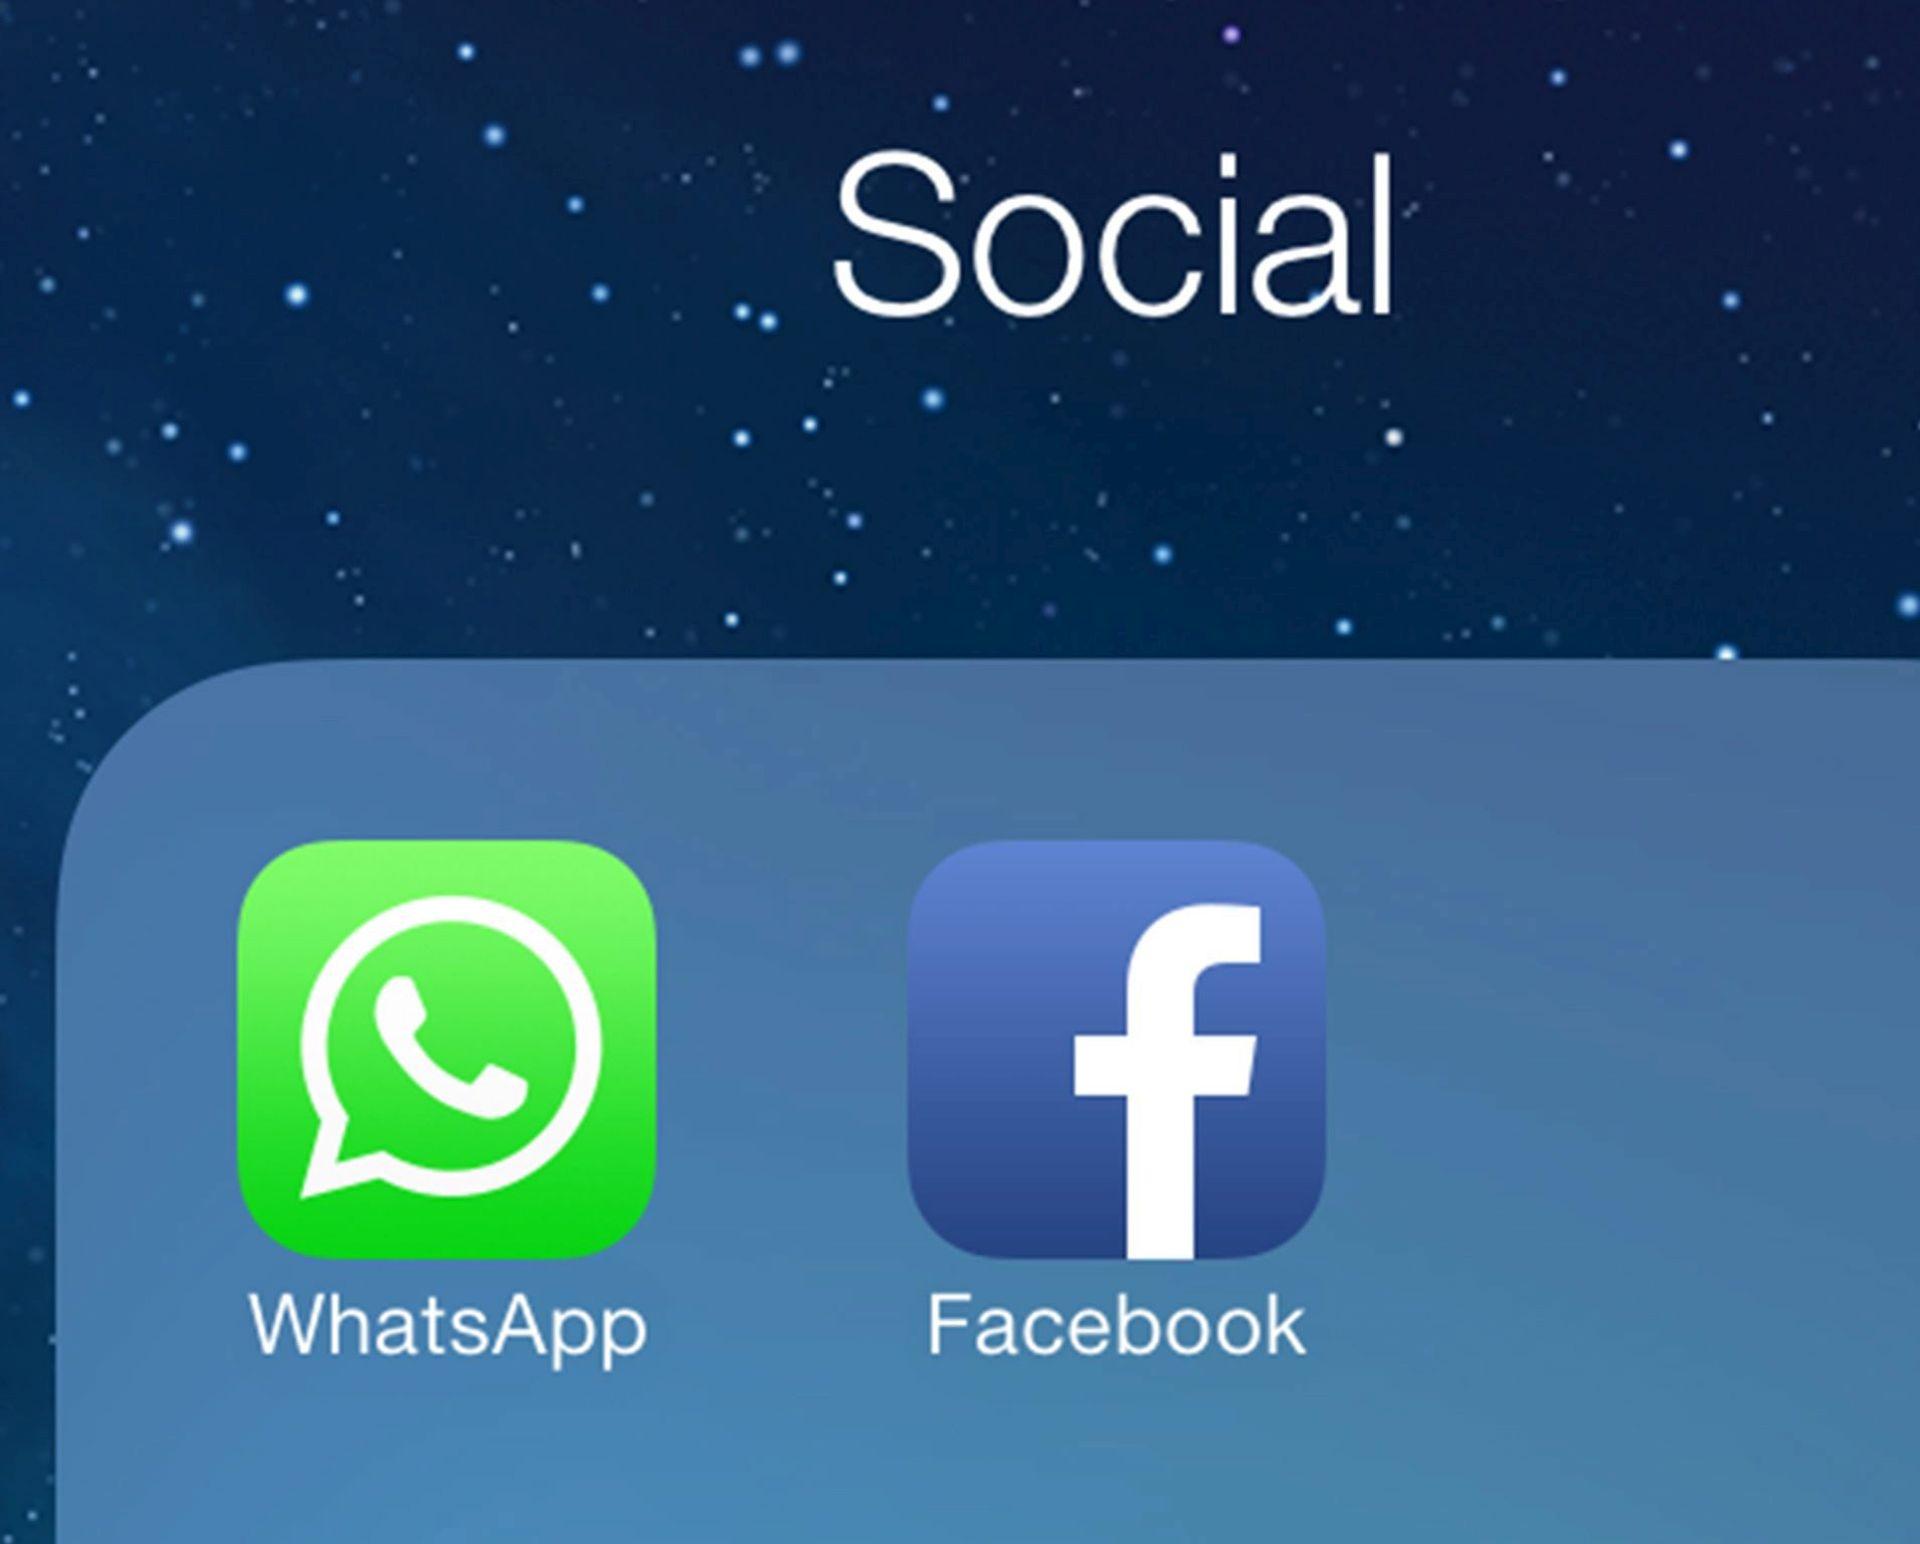 FORMIRALI PARTNERSTVO: Facebook, Microsoft, Twitter i YouTube u borbi protiv terorističke propagande